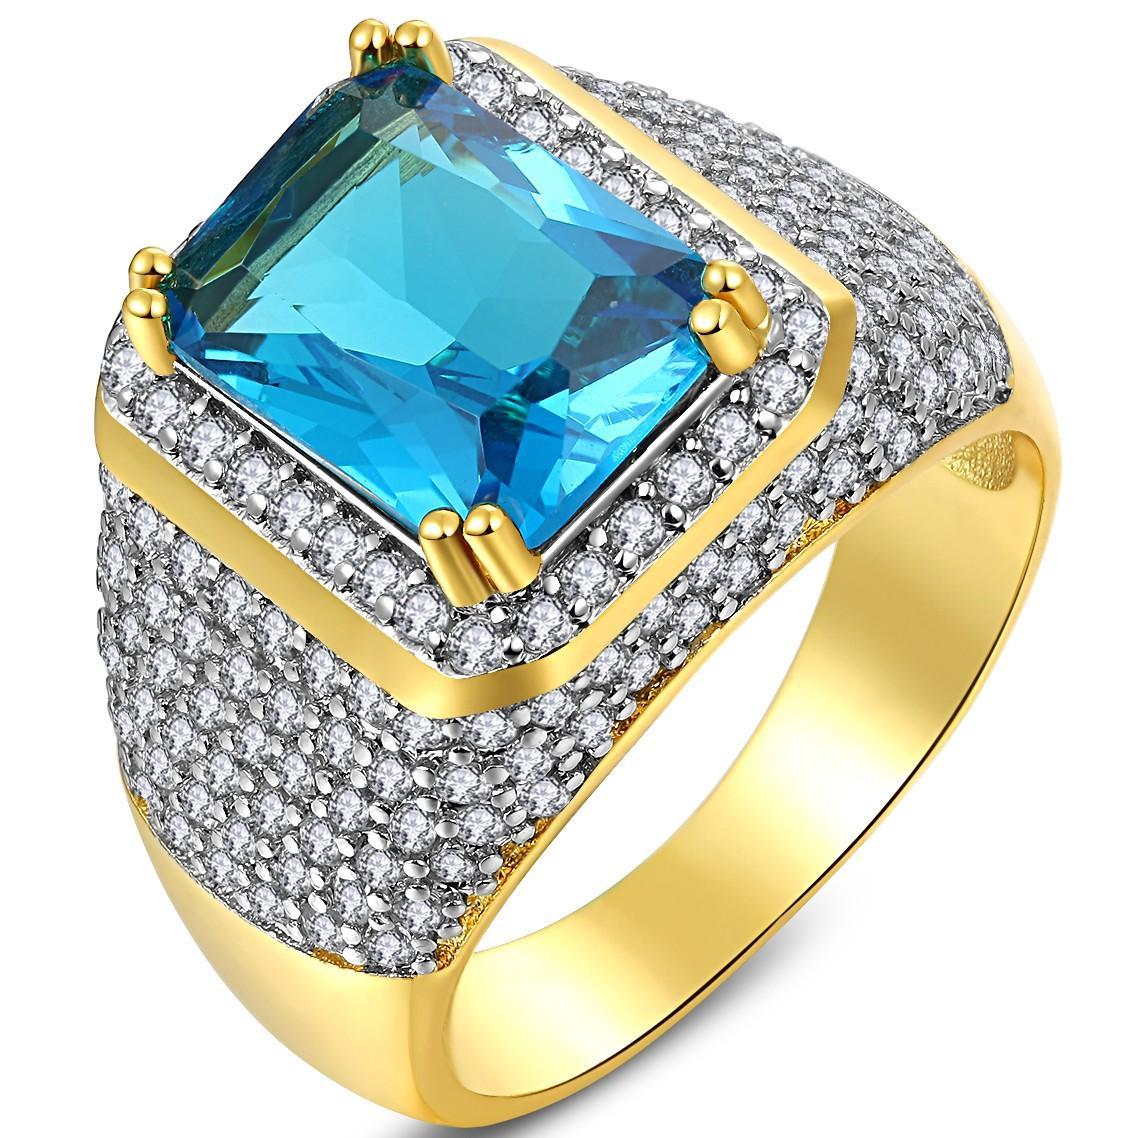 AAA Modis Populer Pria Pria 18 K Emas Diisi Pertunangan Shinng Cincin With 260 Pcs Putih Kecil Zirkon Batu Di sekitar Ukuran 8-15-Intl